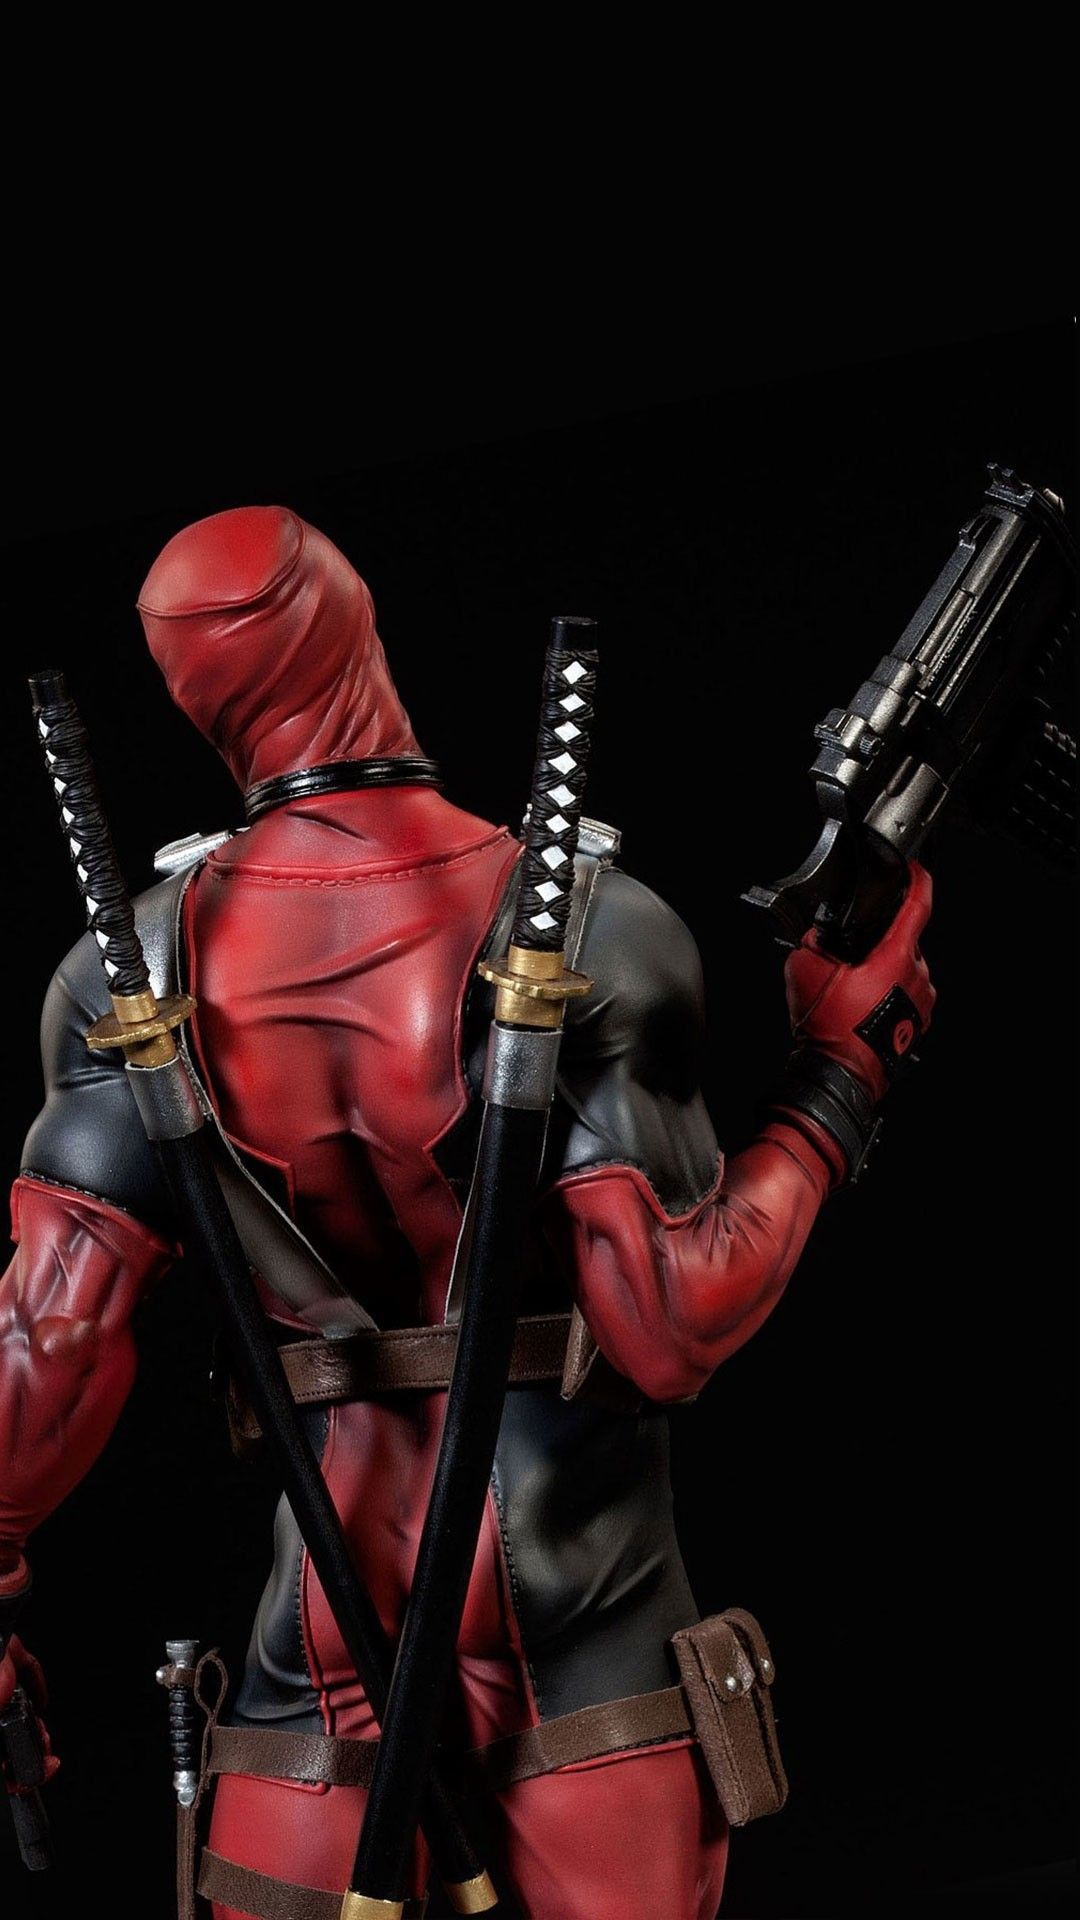 Deadpool Türkçe Dublaj Izle Full Hd Film Izle 123 Fil Arşivi